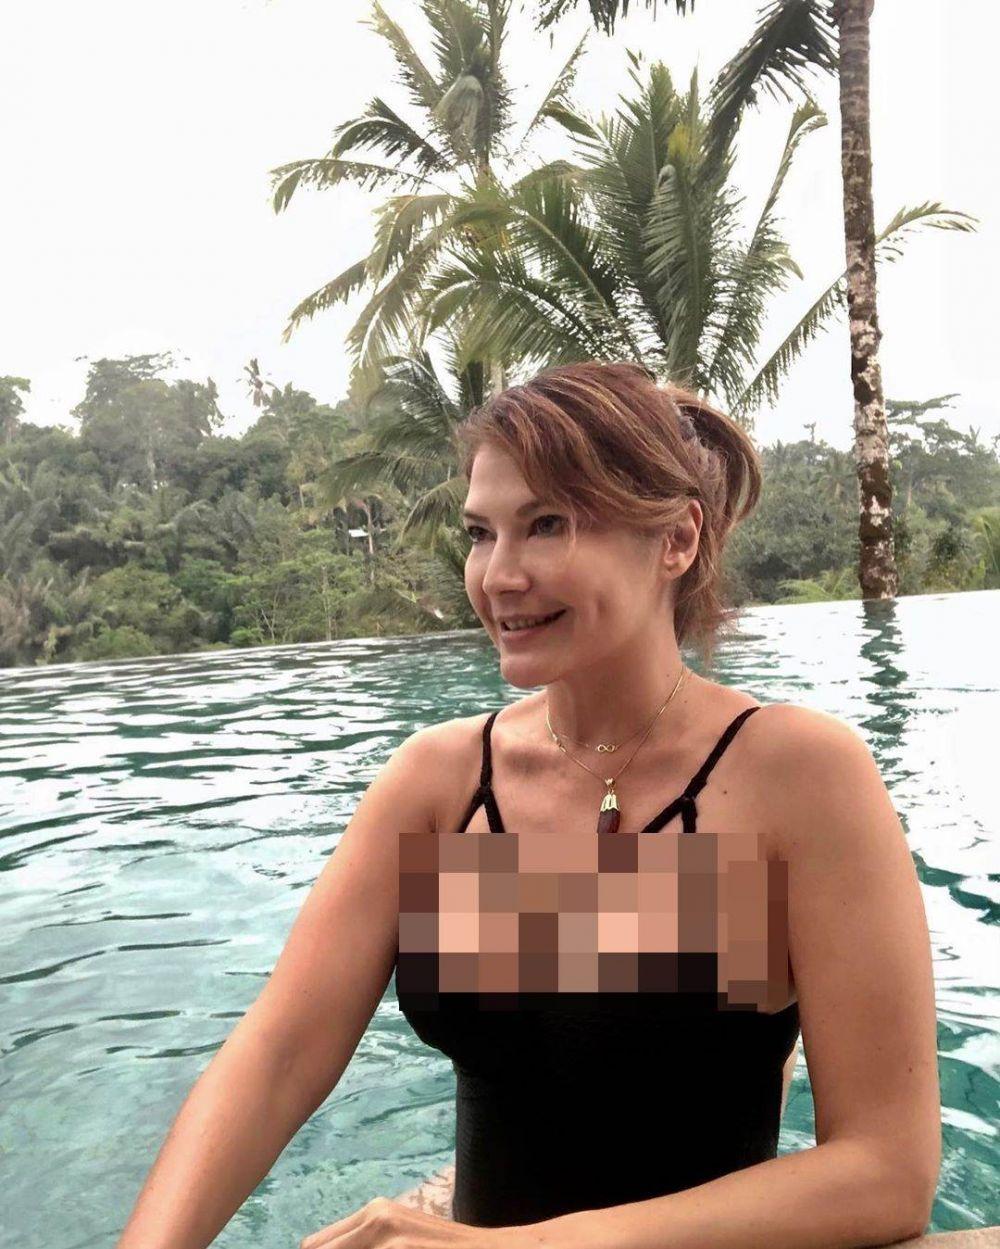 Komentar Inul di foto Tamara Bleszynski pakai bikini jadi sorotan instagram